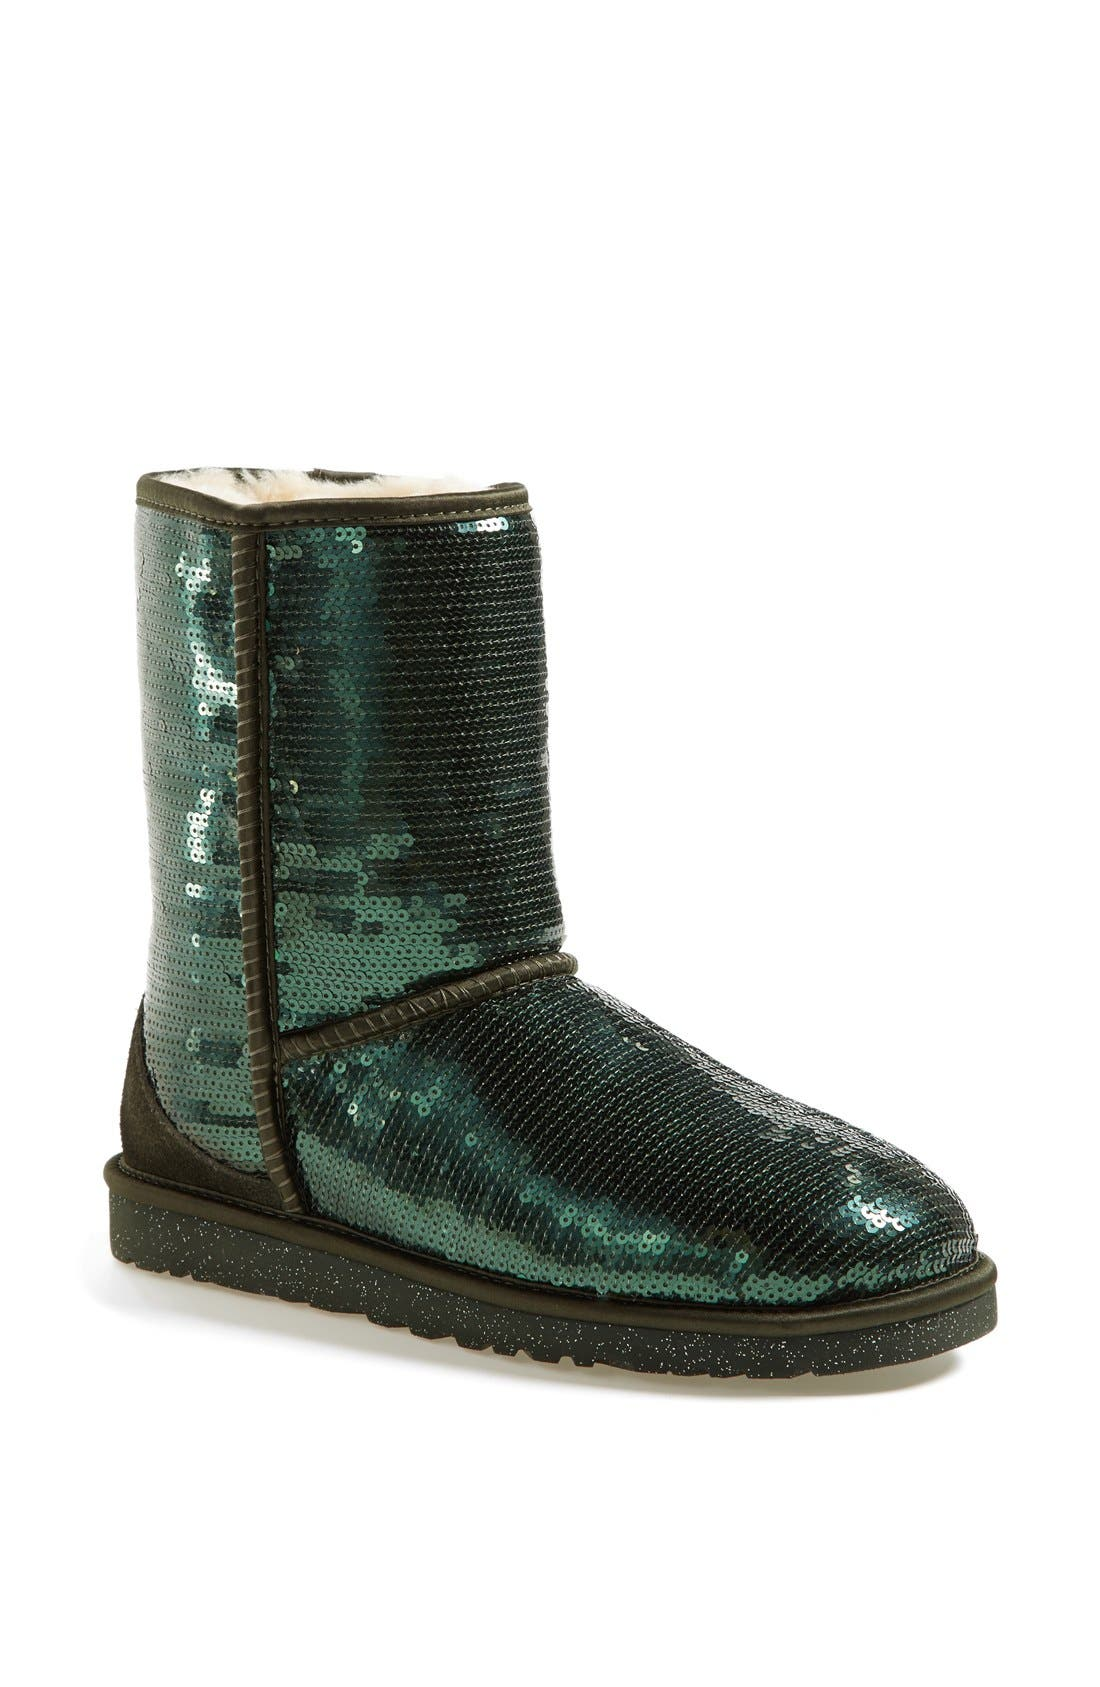 Alternate Image 1 Selected - UGG® Australia 'Classic Short Sparkles' Boot (Women)